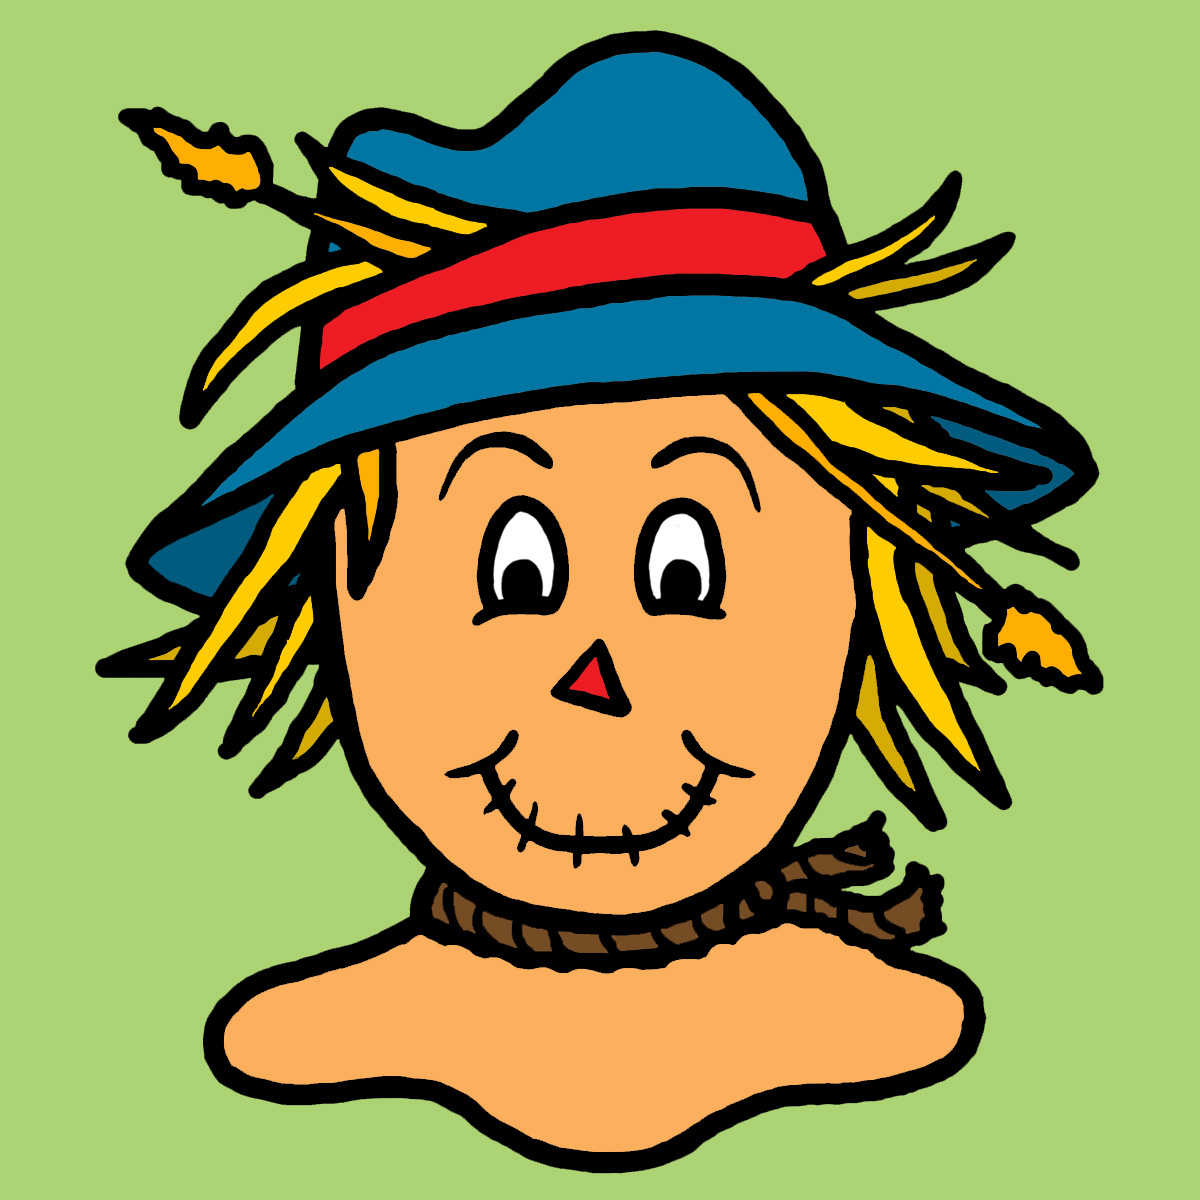 Cute scarecrow clipart 2